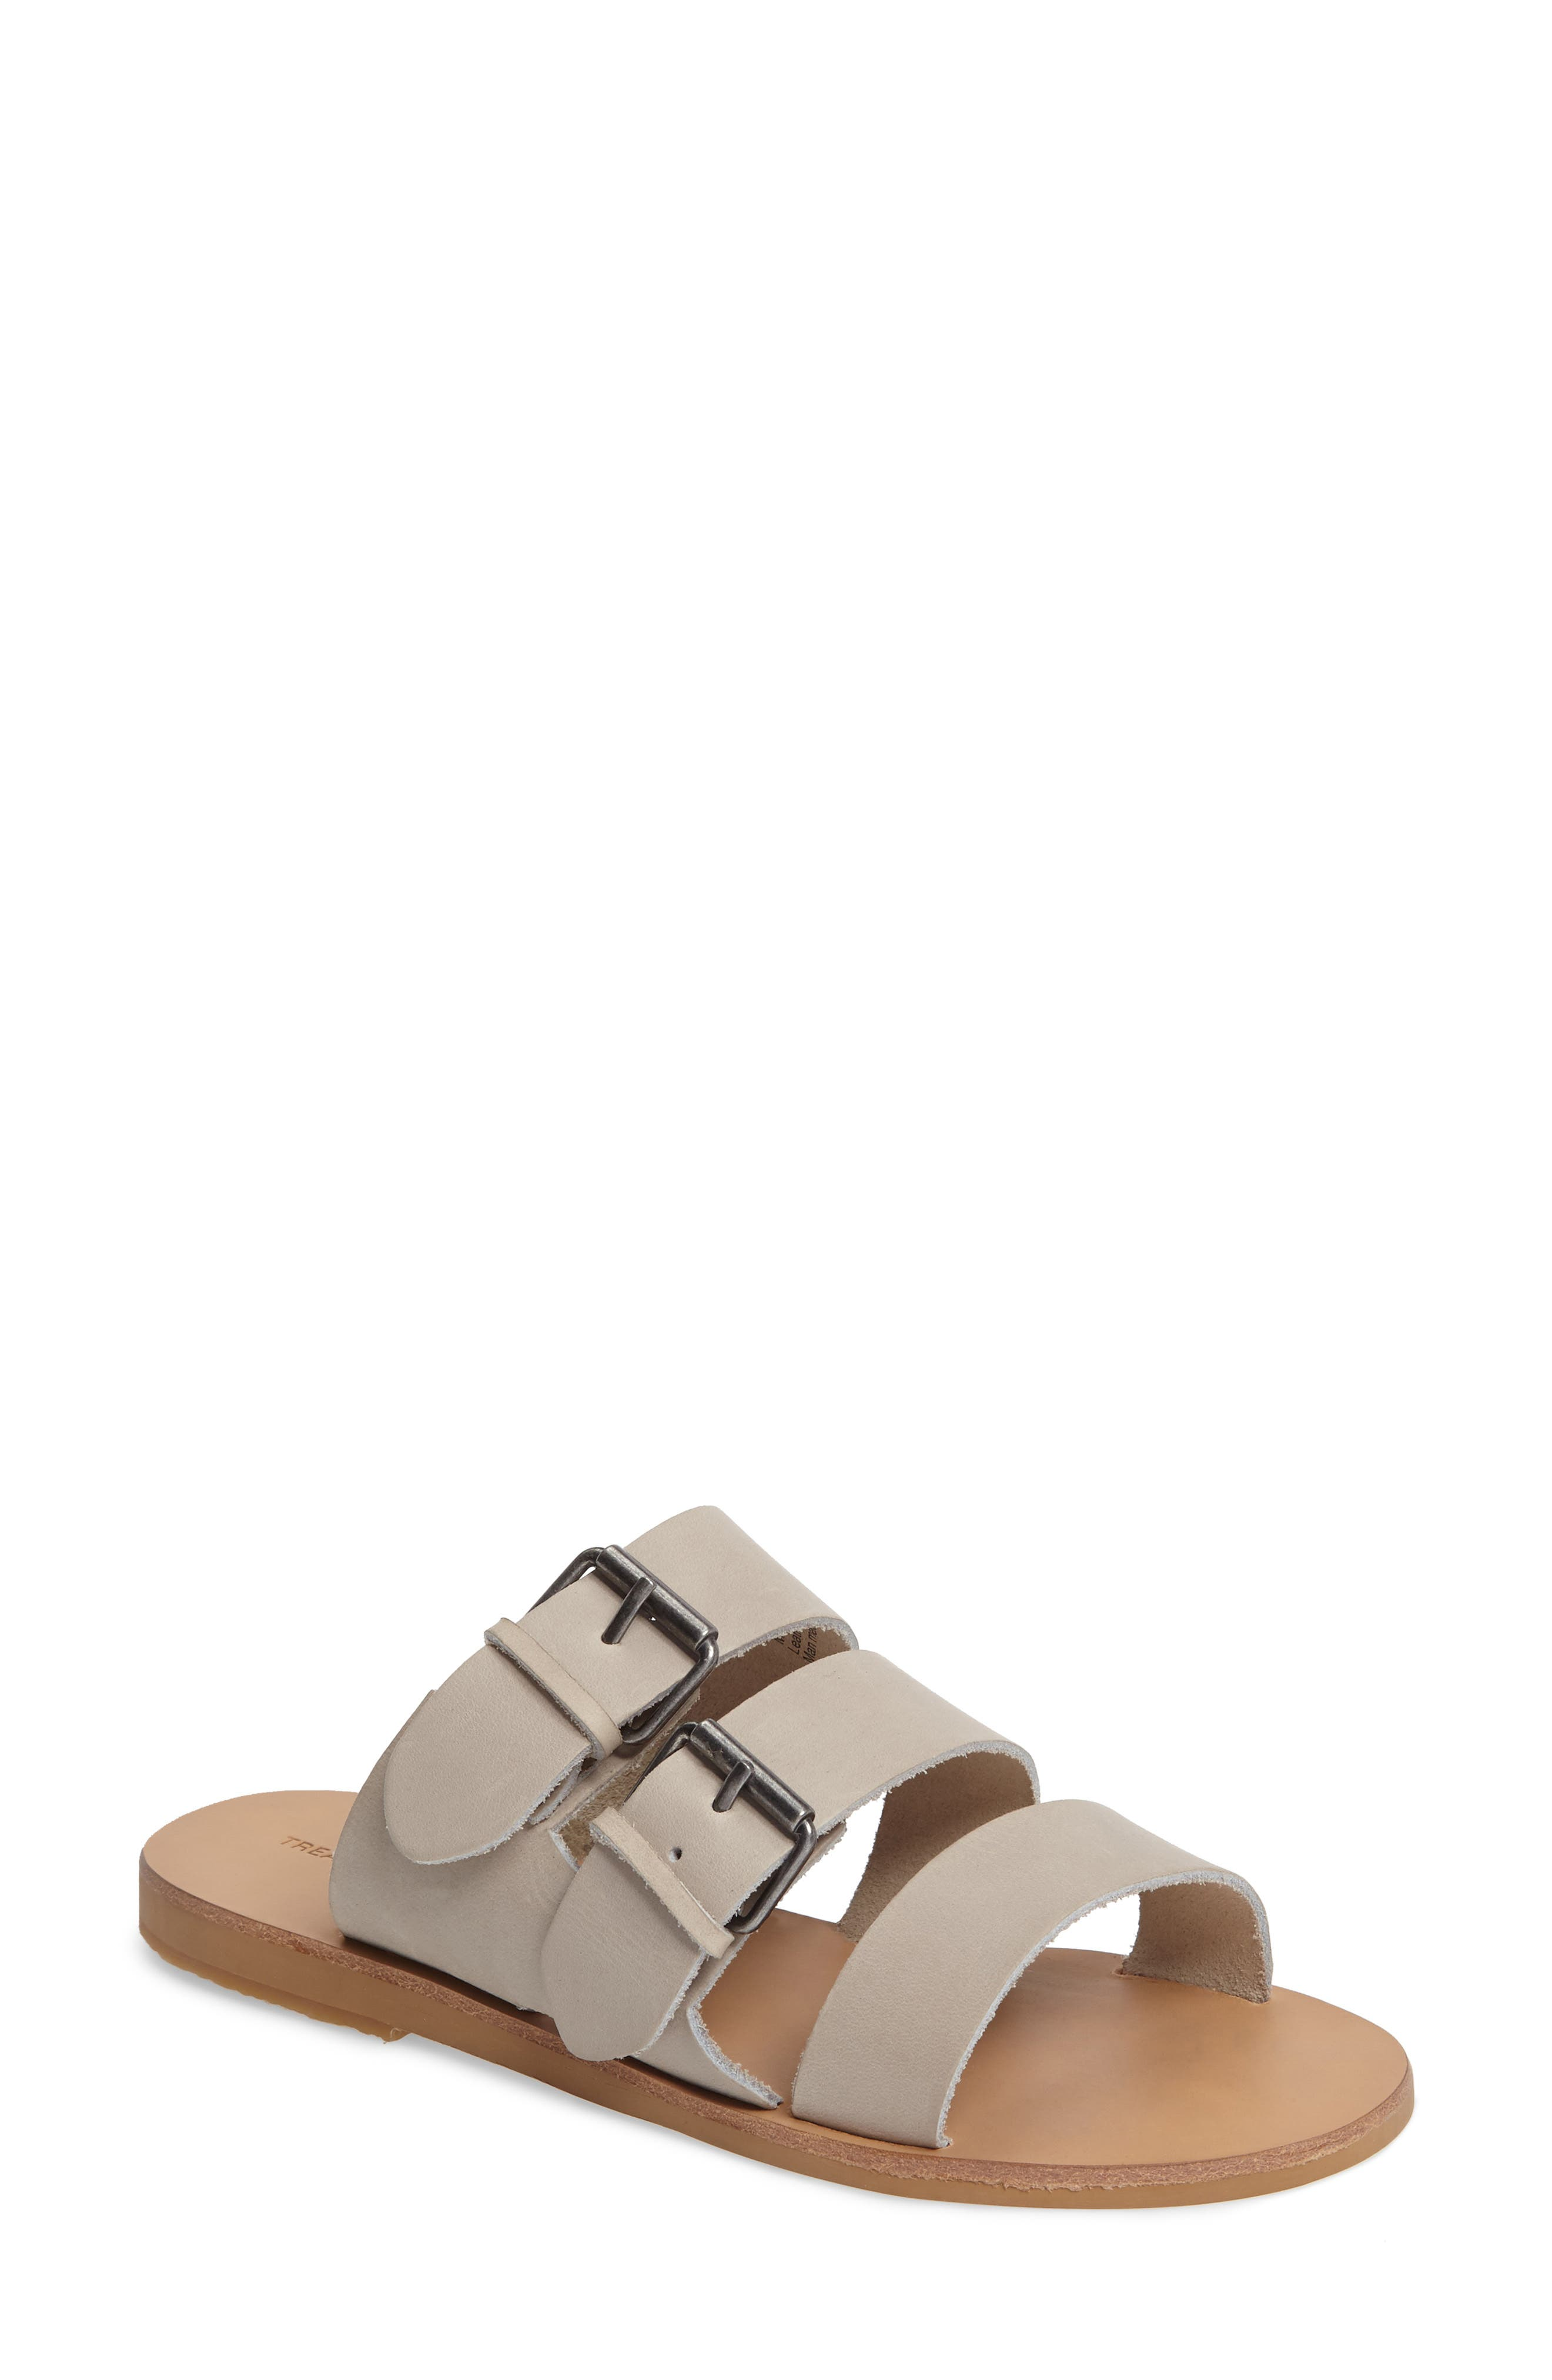 TREASURE & BOND Decklan Sandal